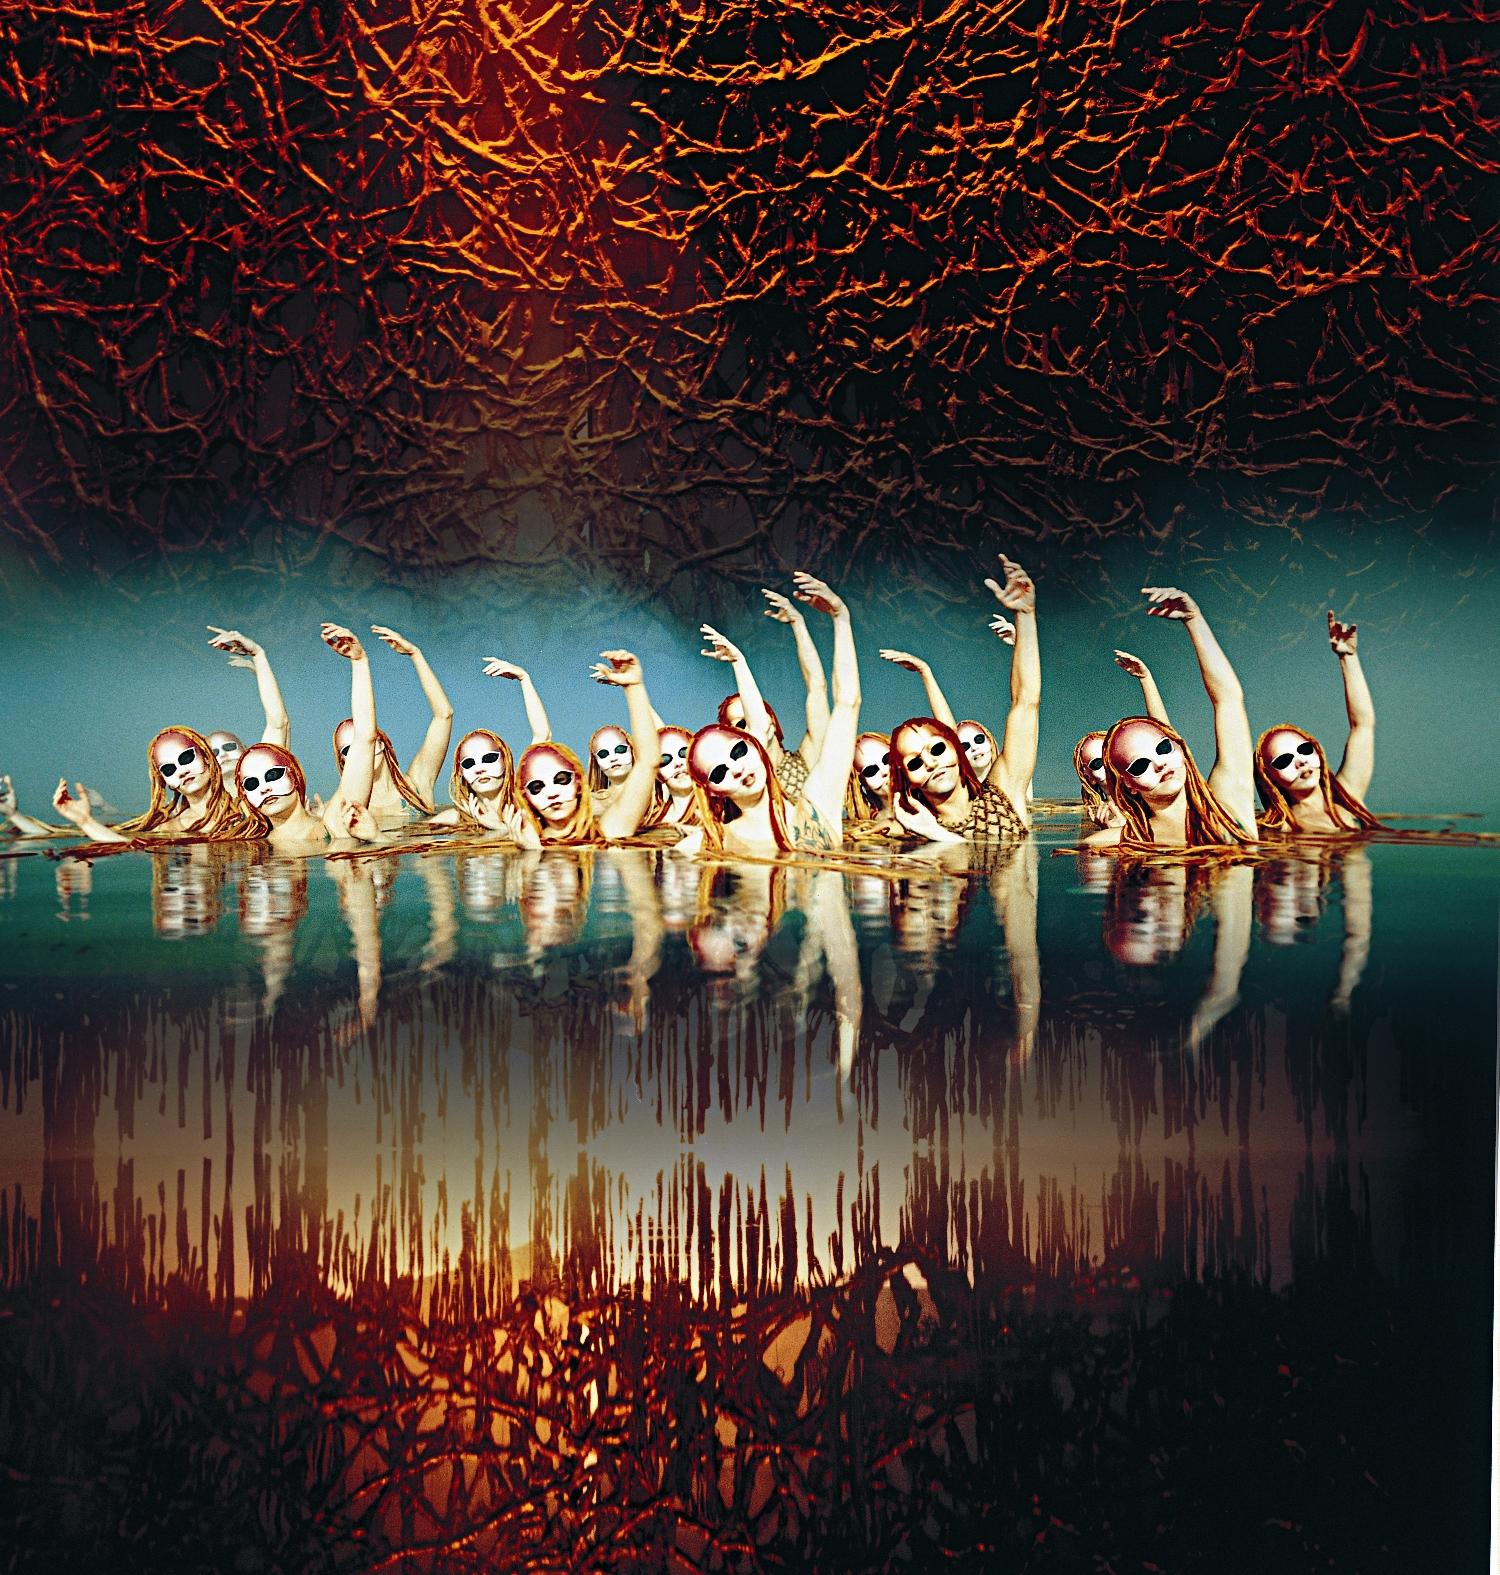 'O' by Cirque du Soleil